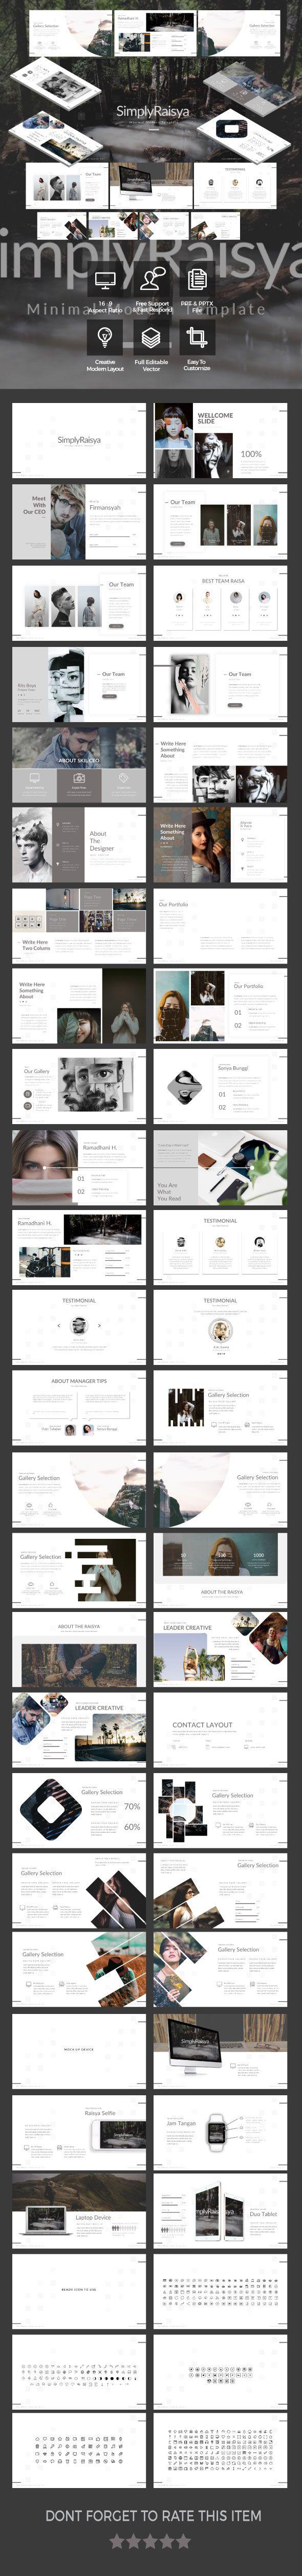 SimplyRaisya - Simple Presentation Template